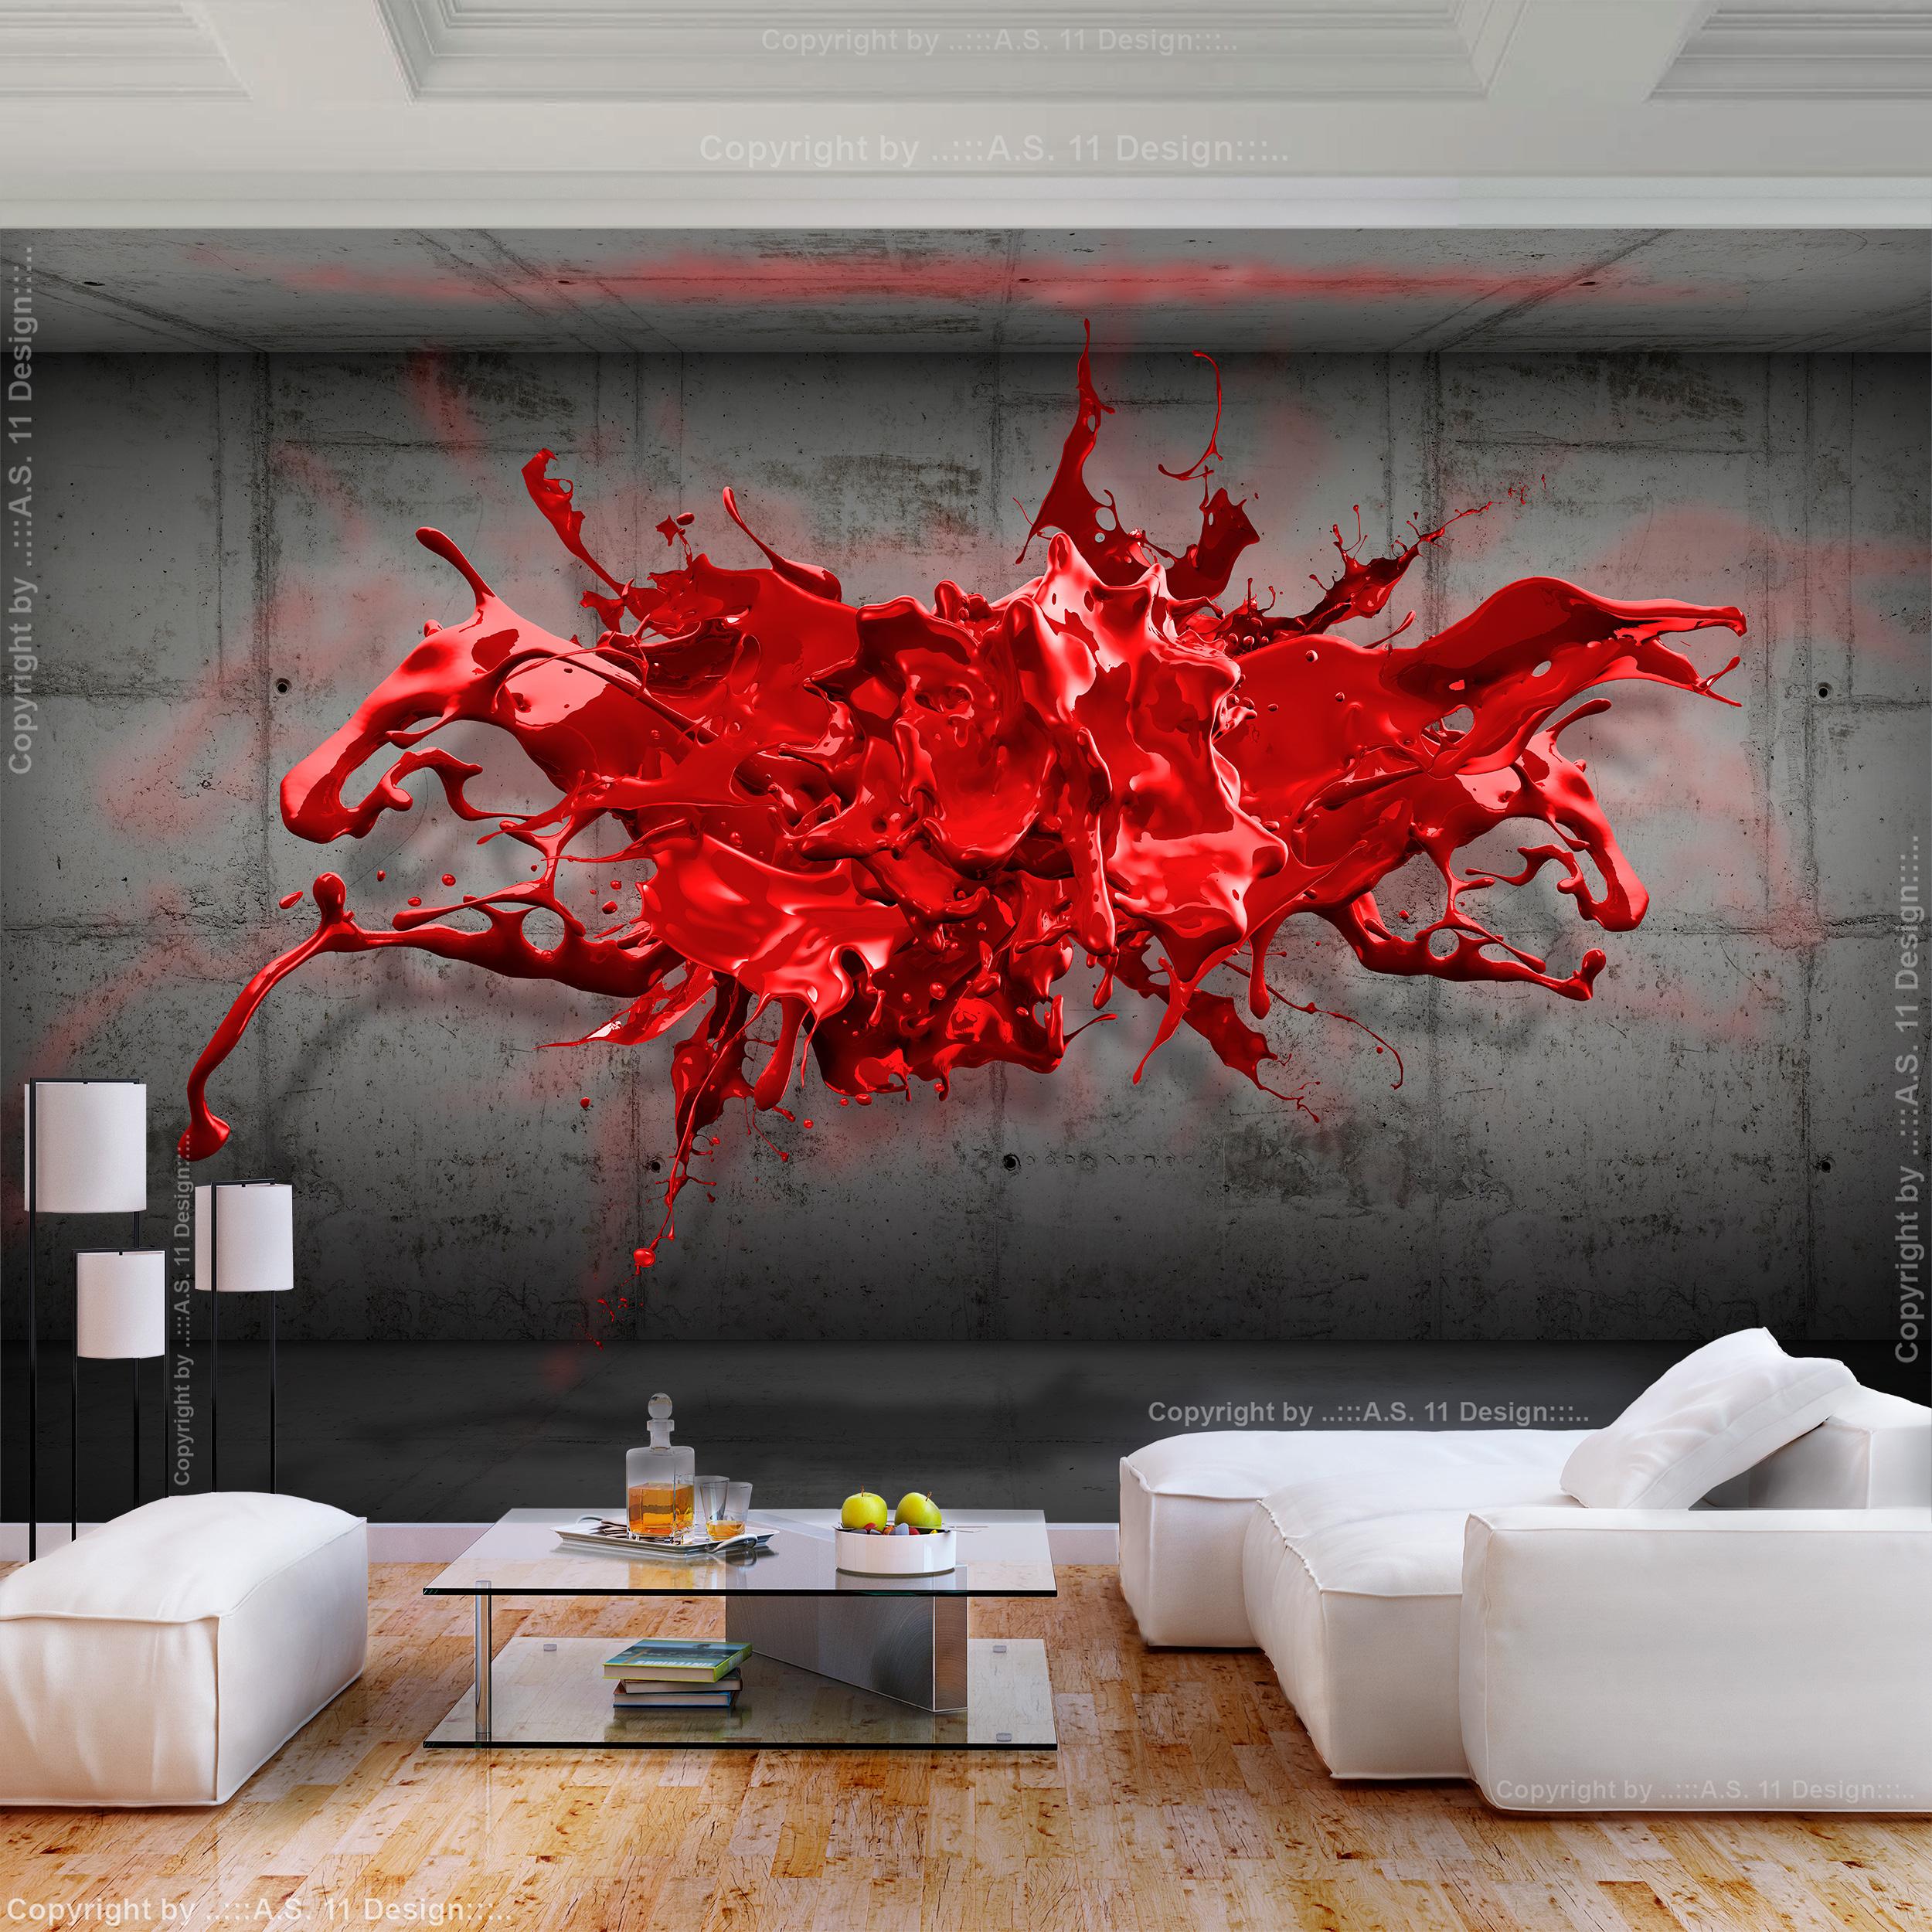 vlies fototapete farbfleck beton 3d effekt tapete wandbilder xxl wohnzimmer 131 ebay. Black Bedroom Furniture Sets. Home Design Ideas